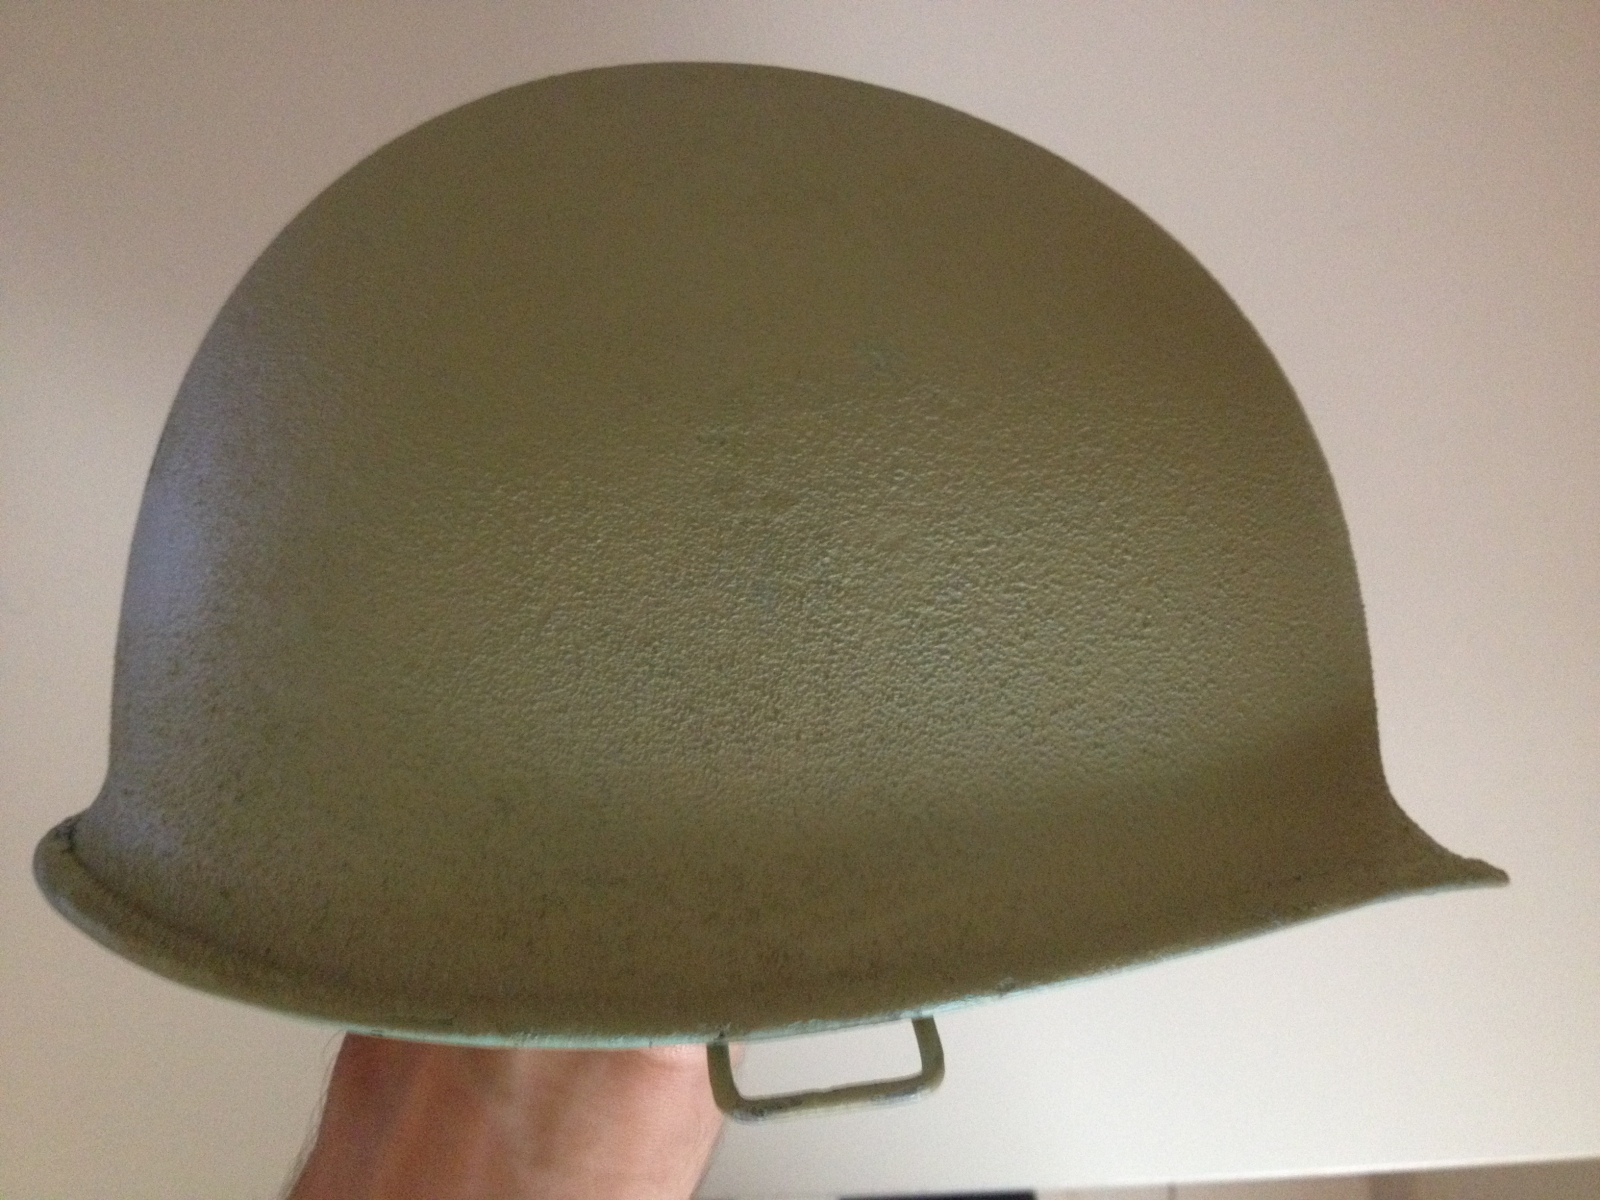 casco - Ayuda casco m1 2yl5rh2